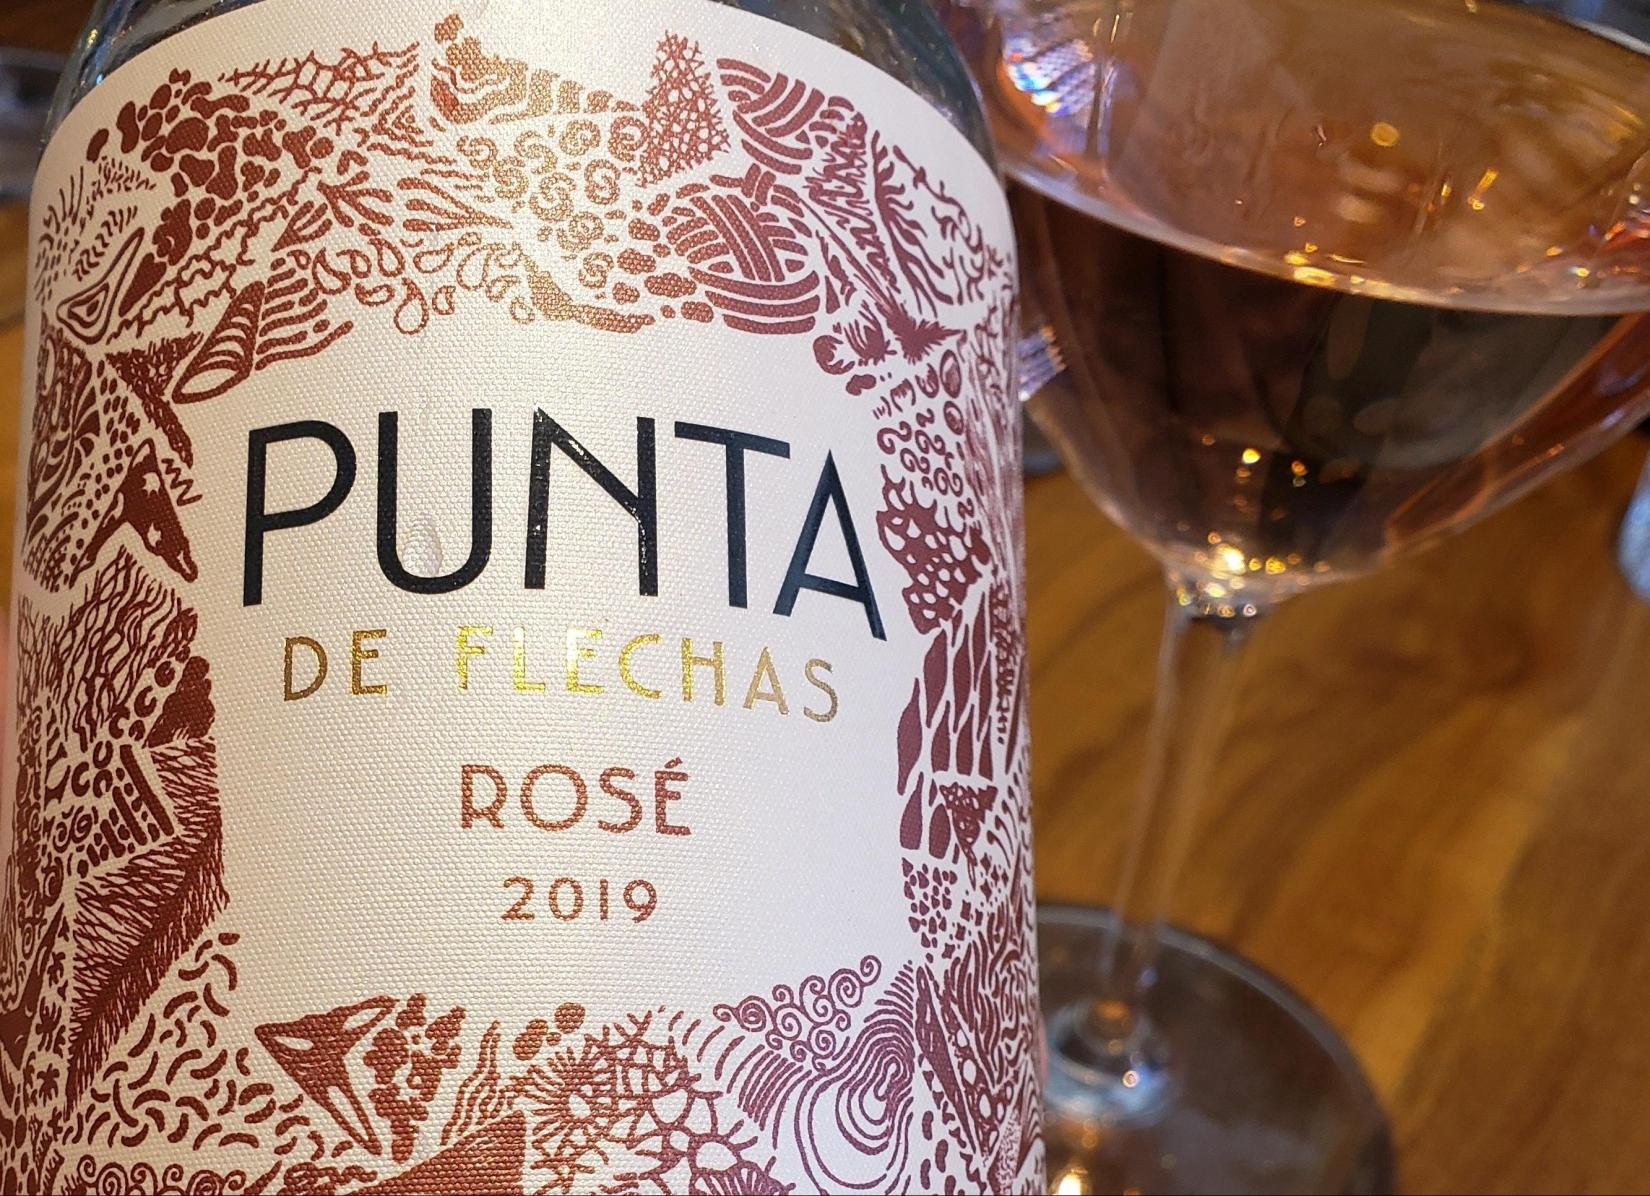 Punta de Flechas Rose 2019 (1)